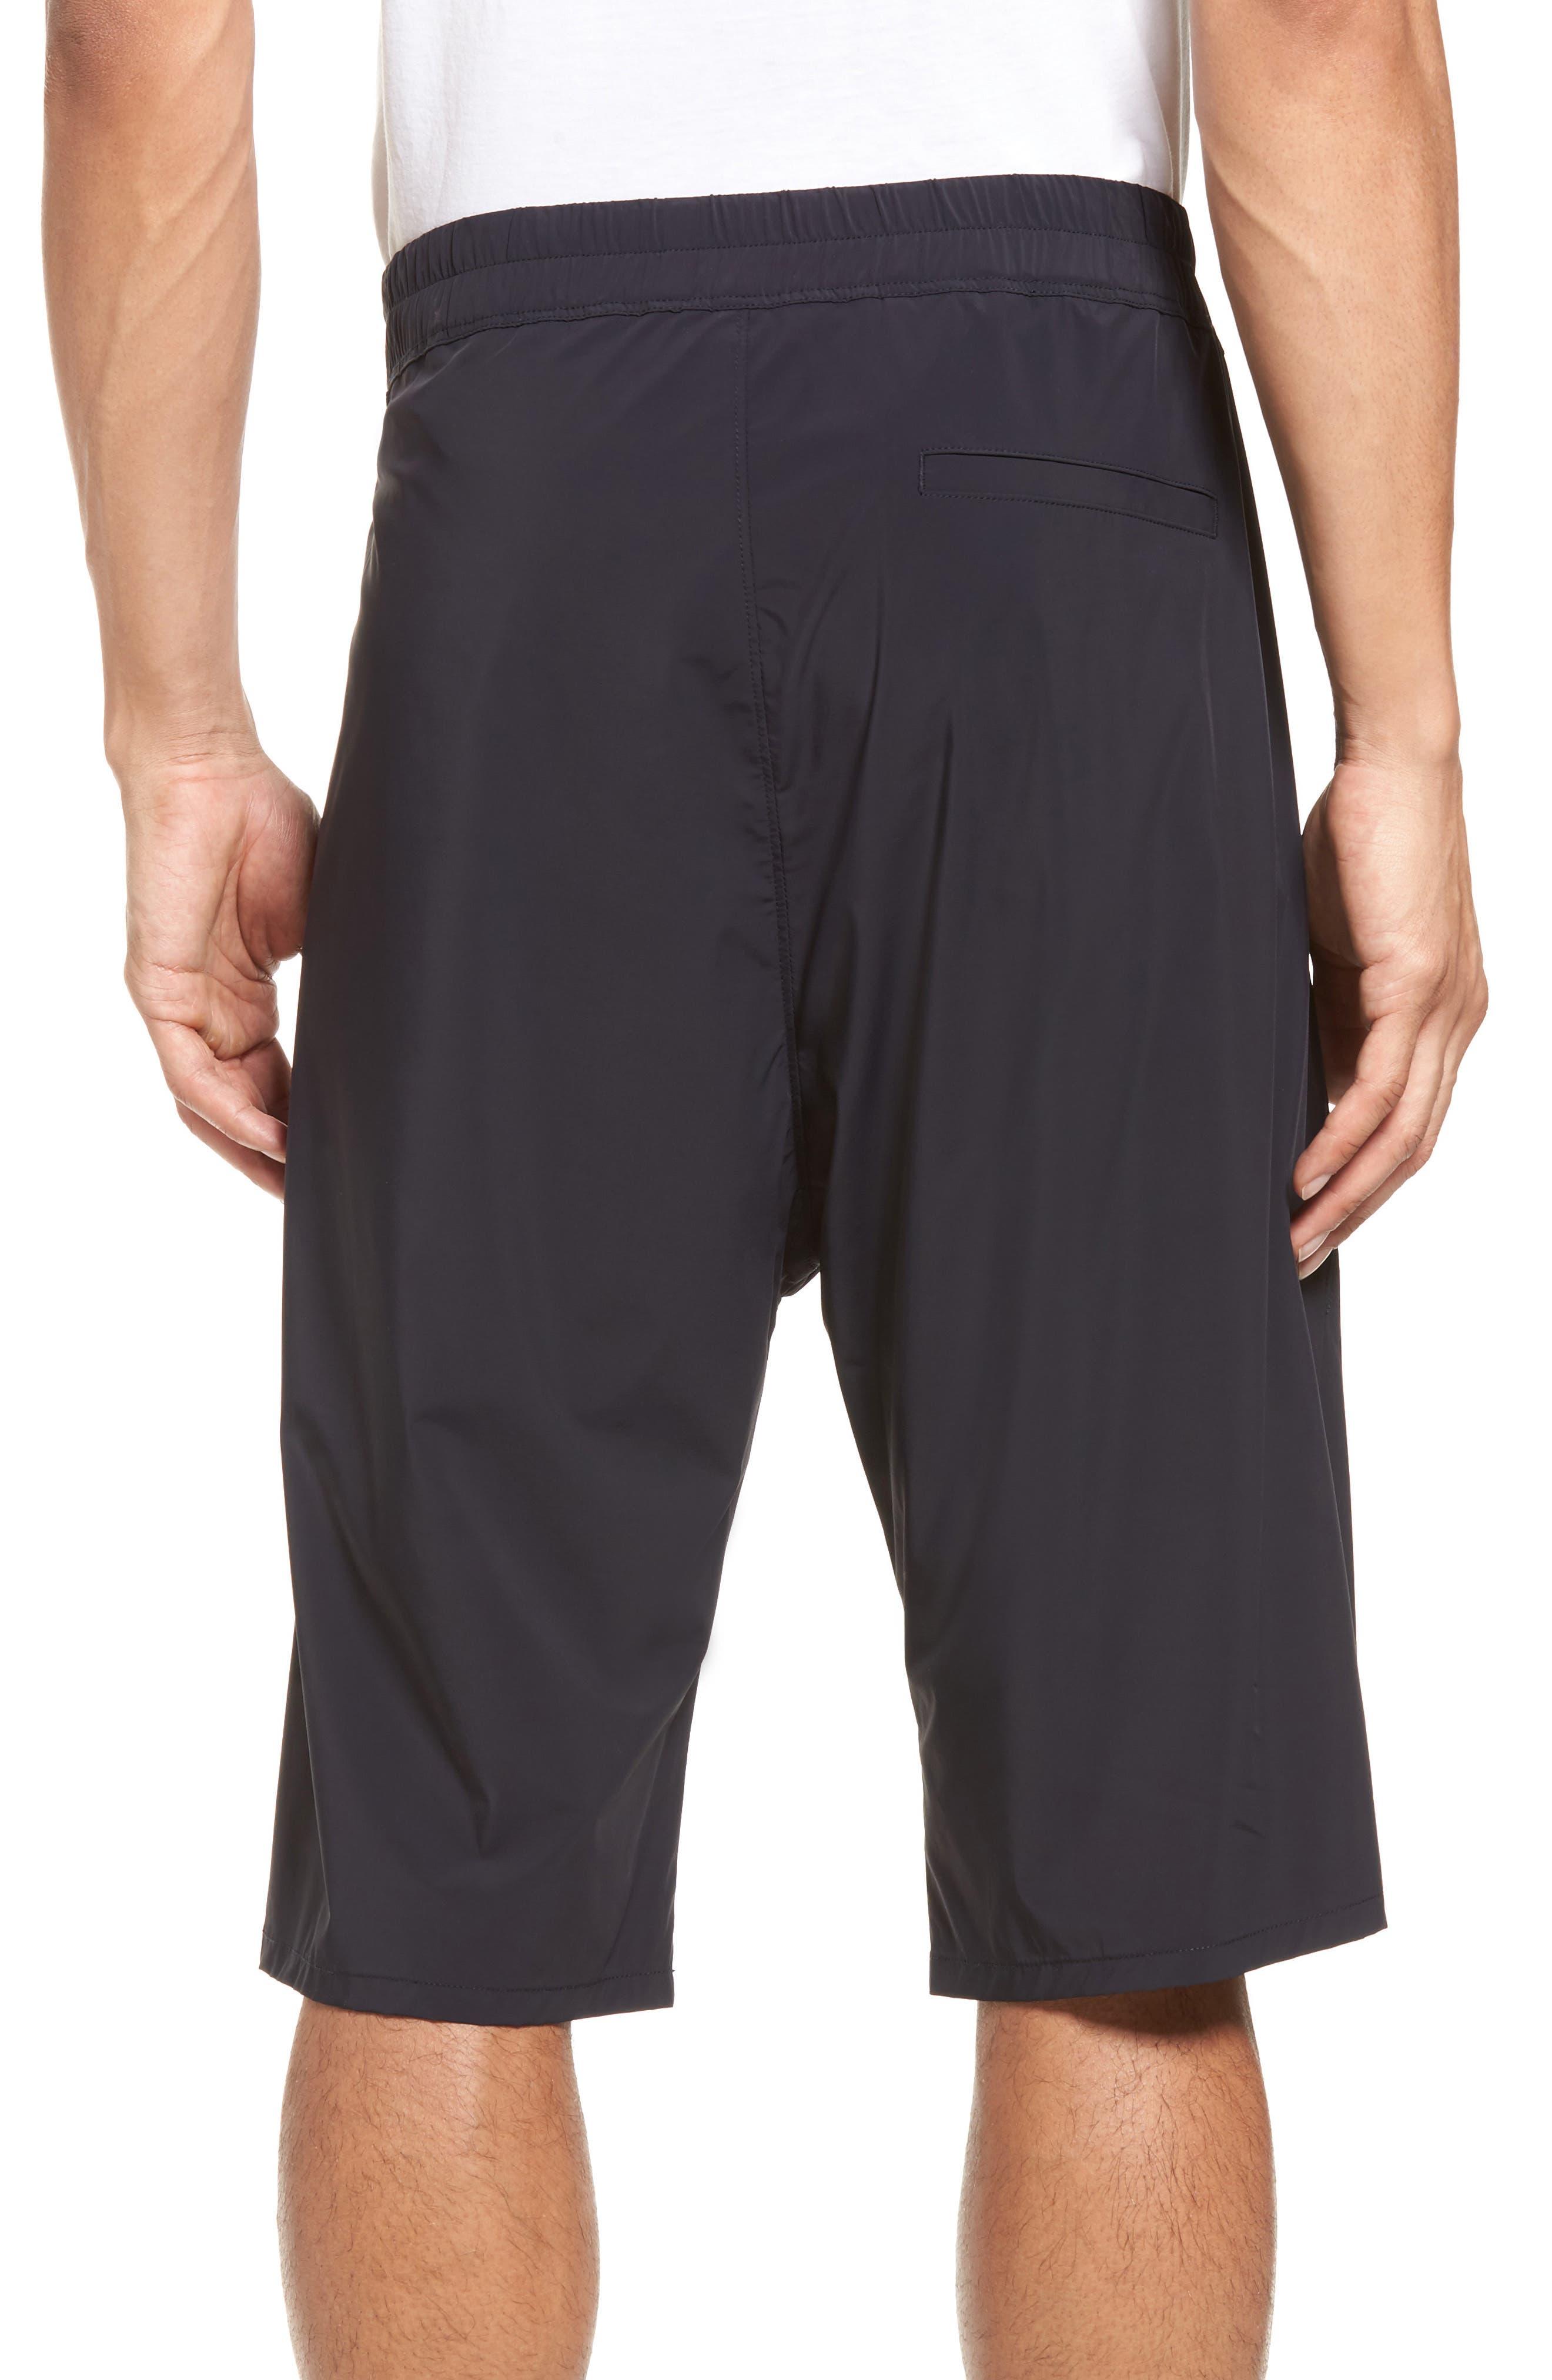 Drop Crotch Shorts,                             Alternate thumbnail 2, color,                             001